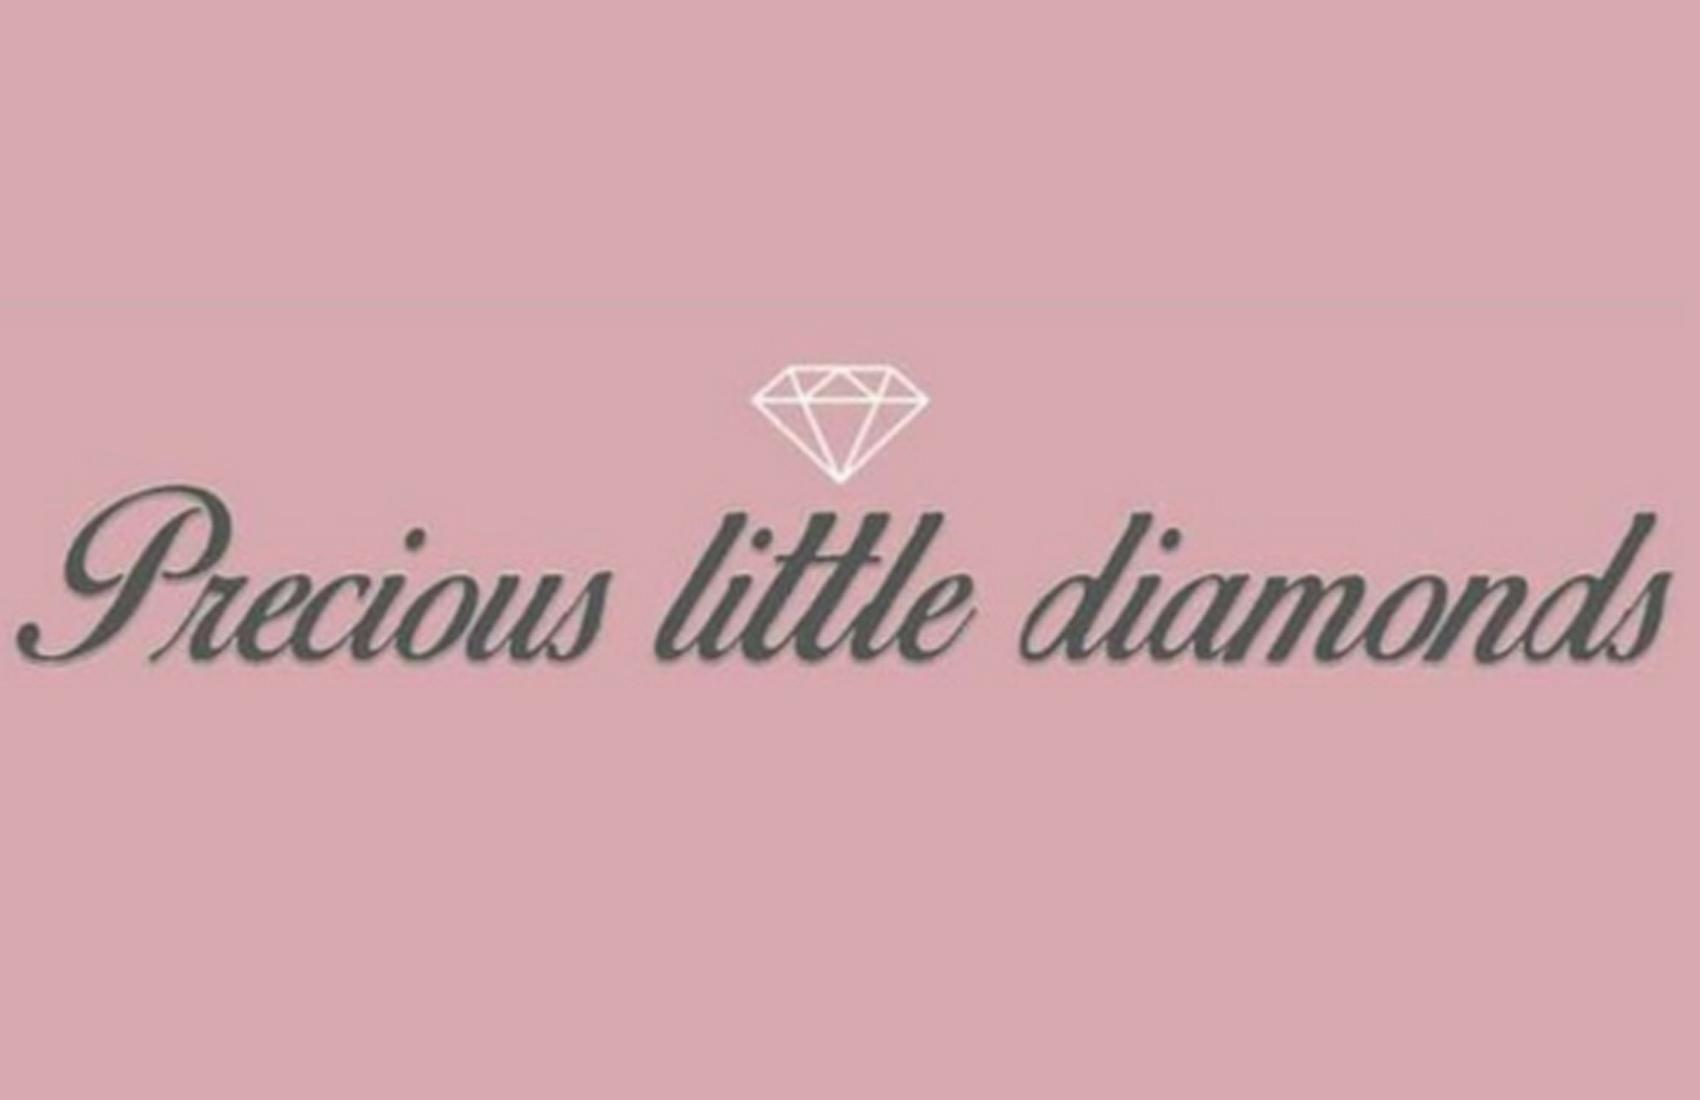 Precious little diamonds